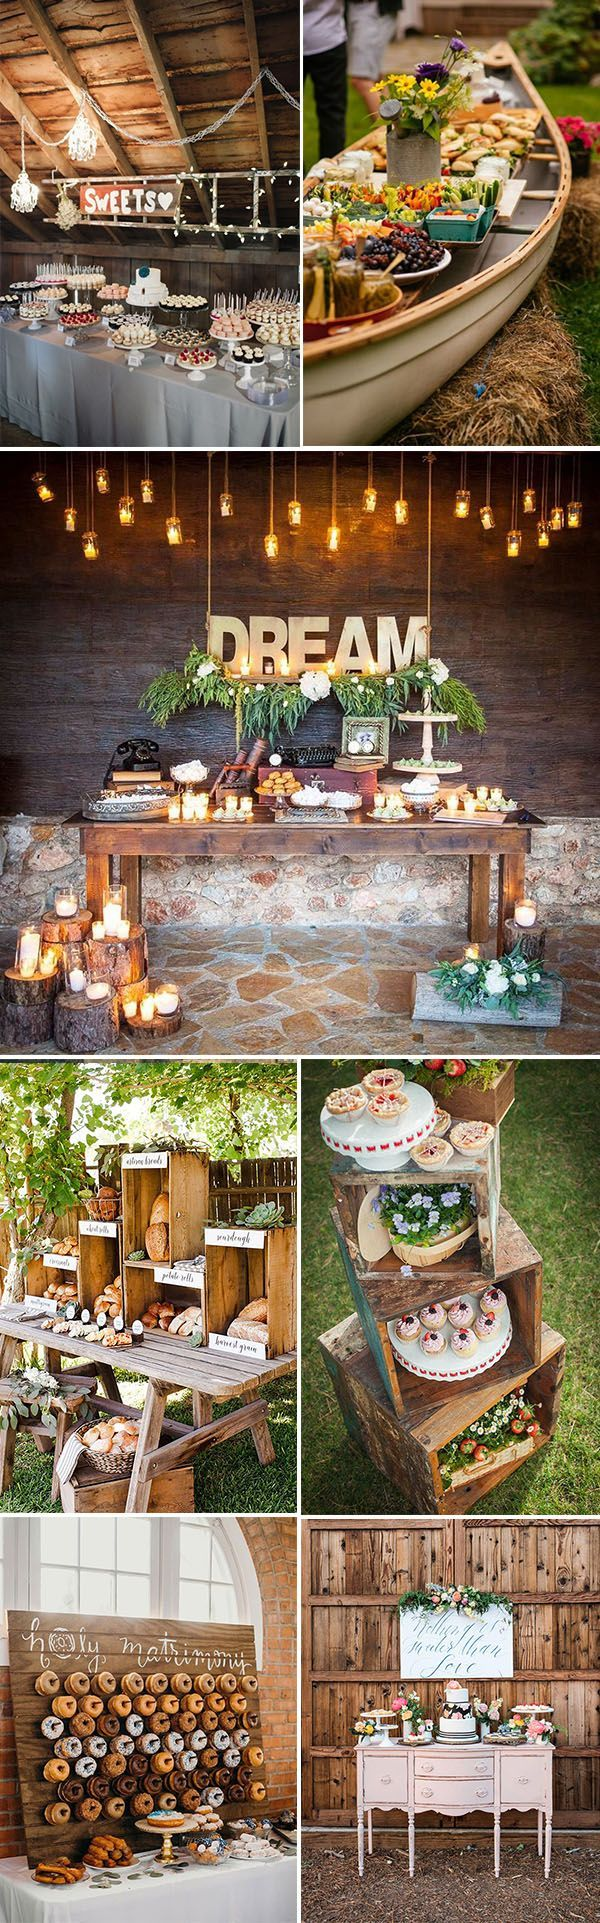 26 inspiring wedding food dessert table ideas#weddingdessertdisplay